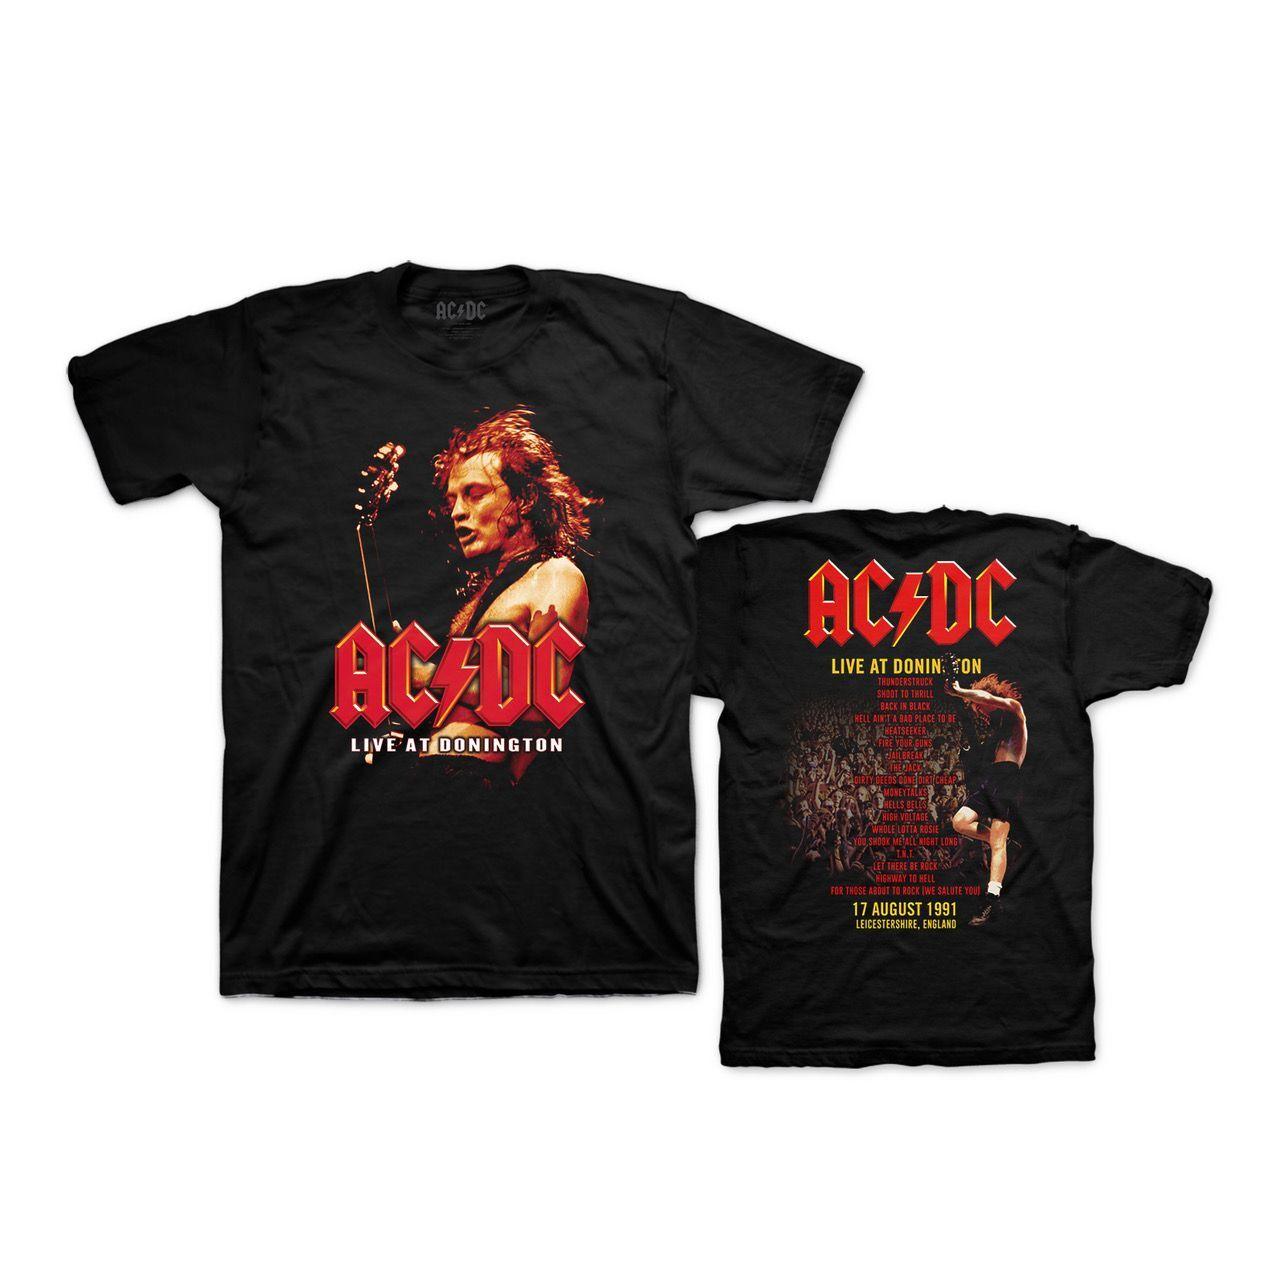 AC/DC Live at Donington T-Shirt